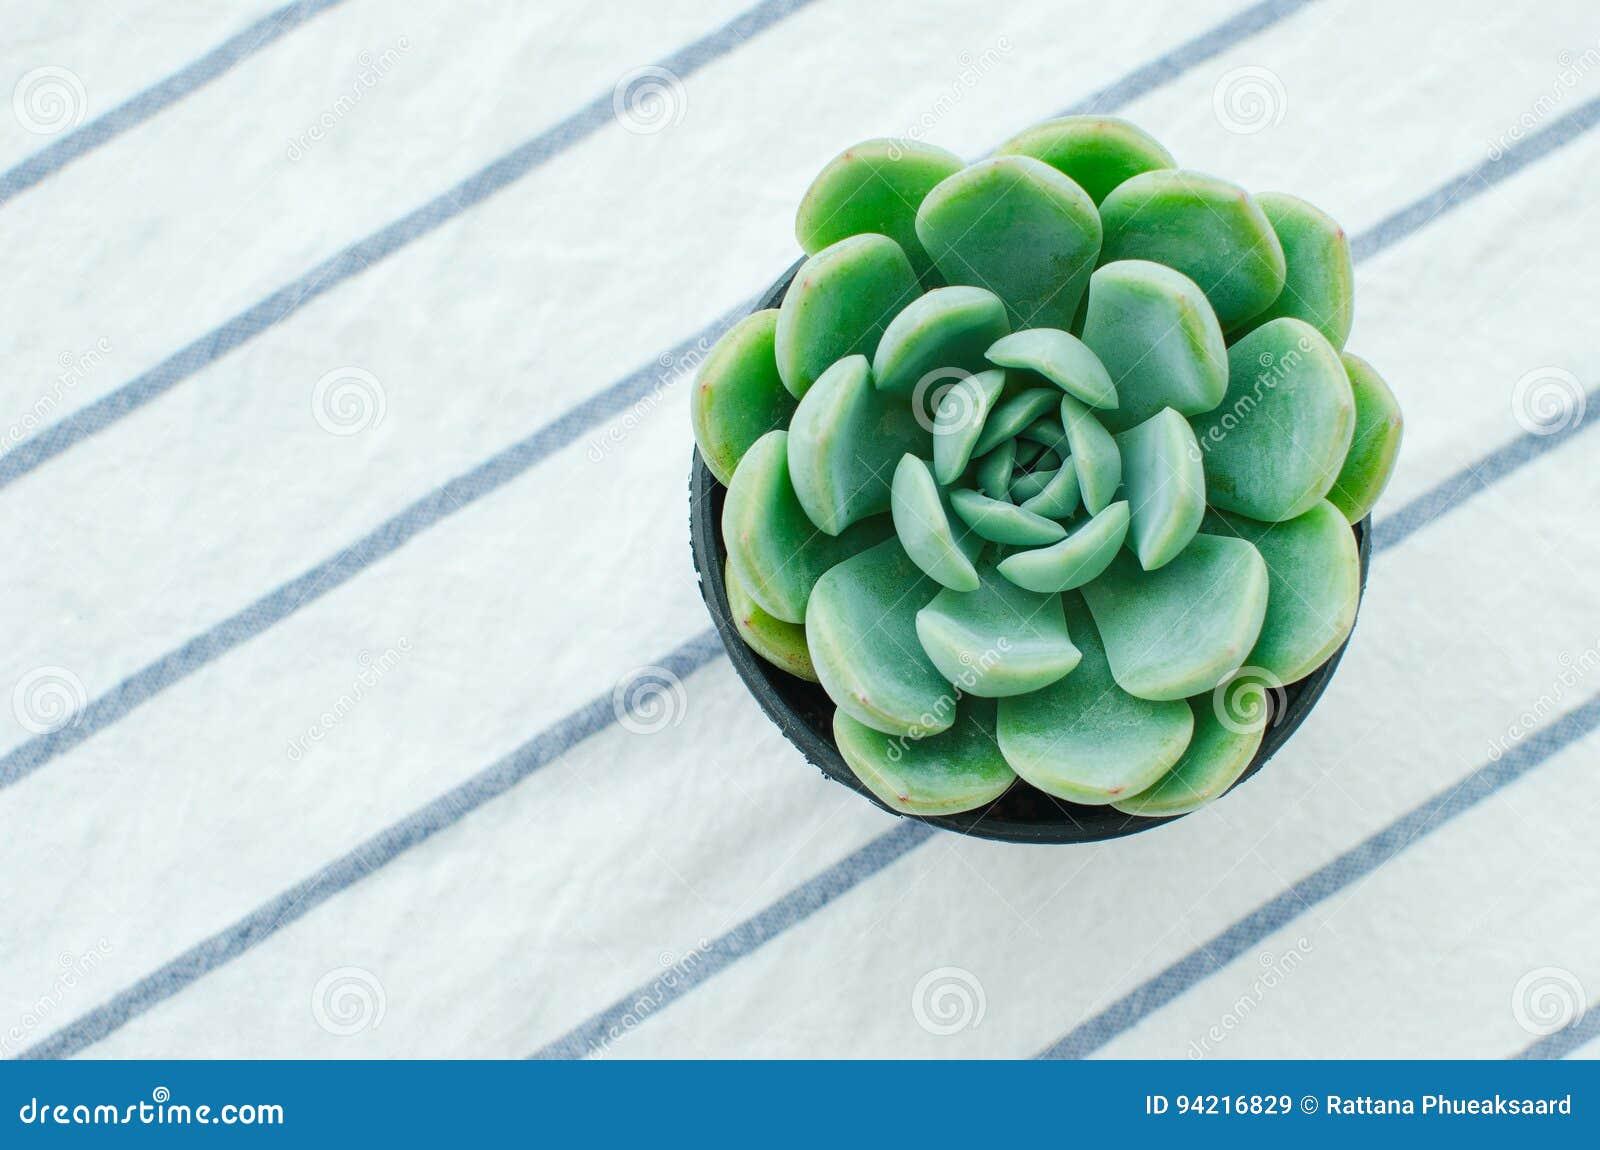 Pastel Green Rosette flowering Plant Echeveria Succulent